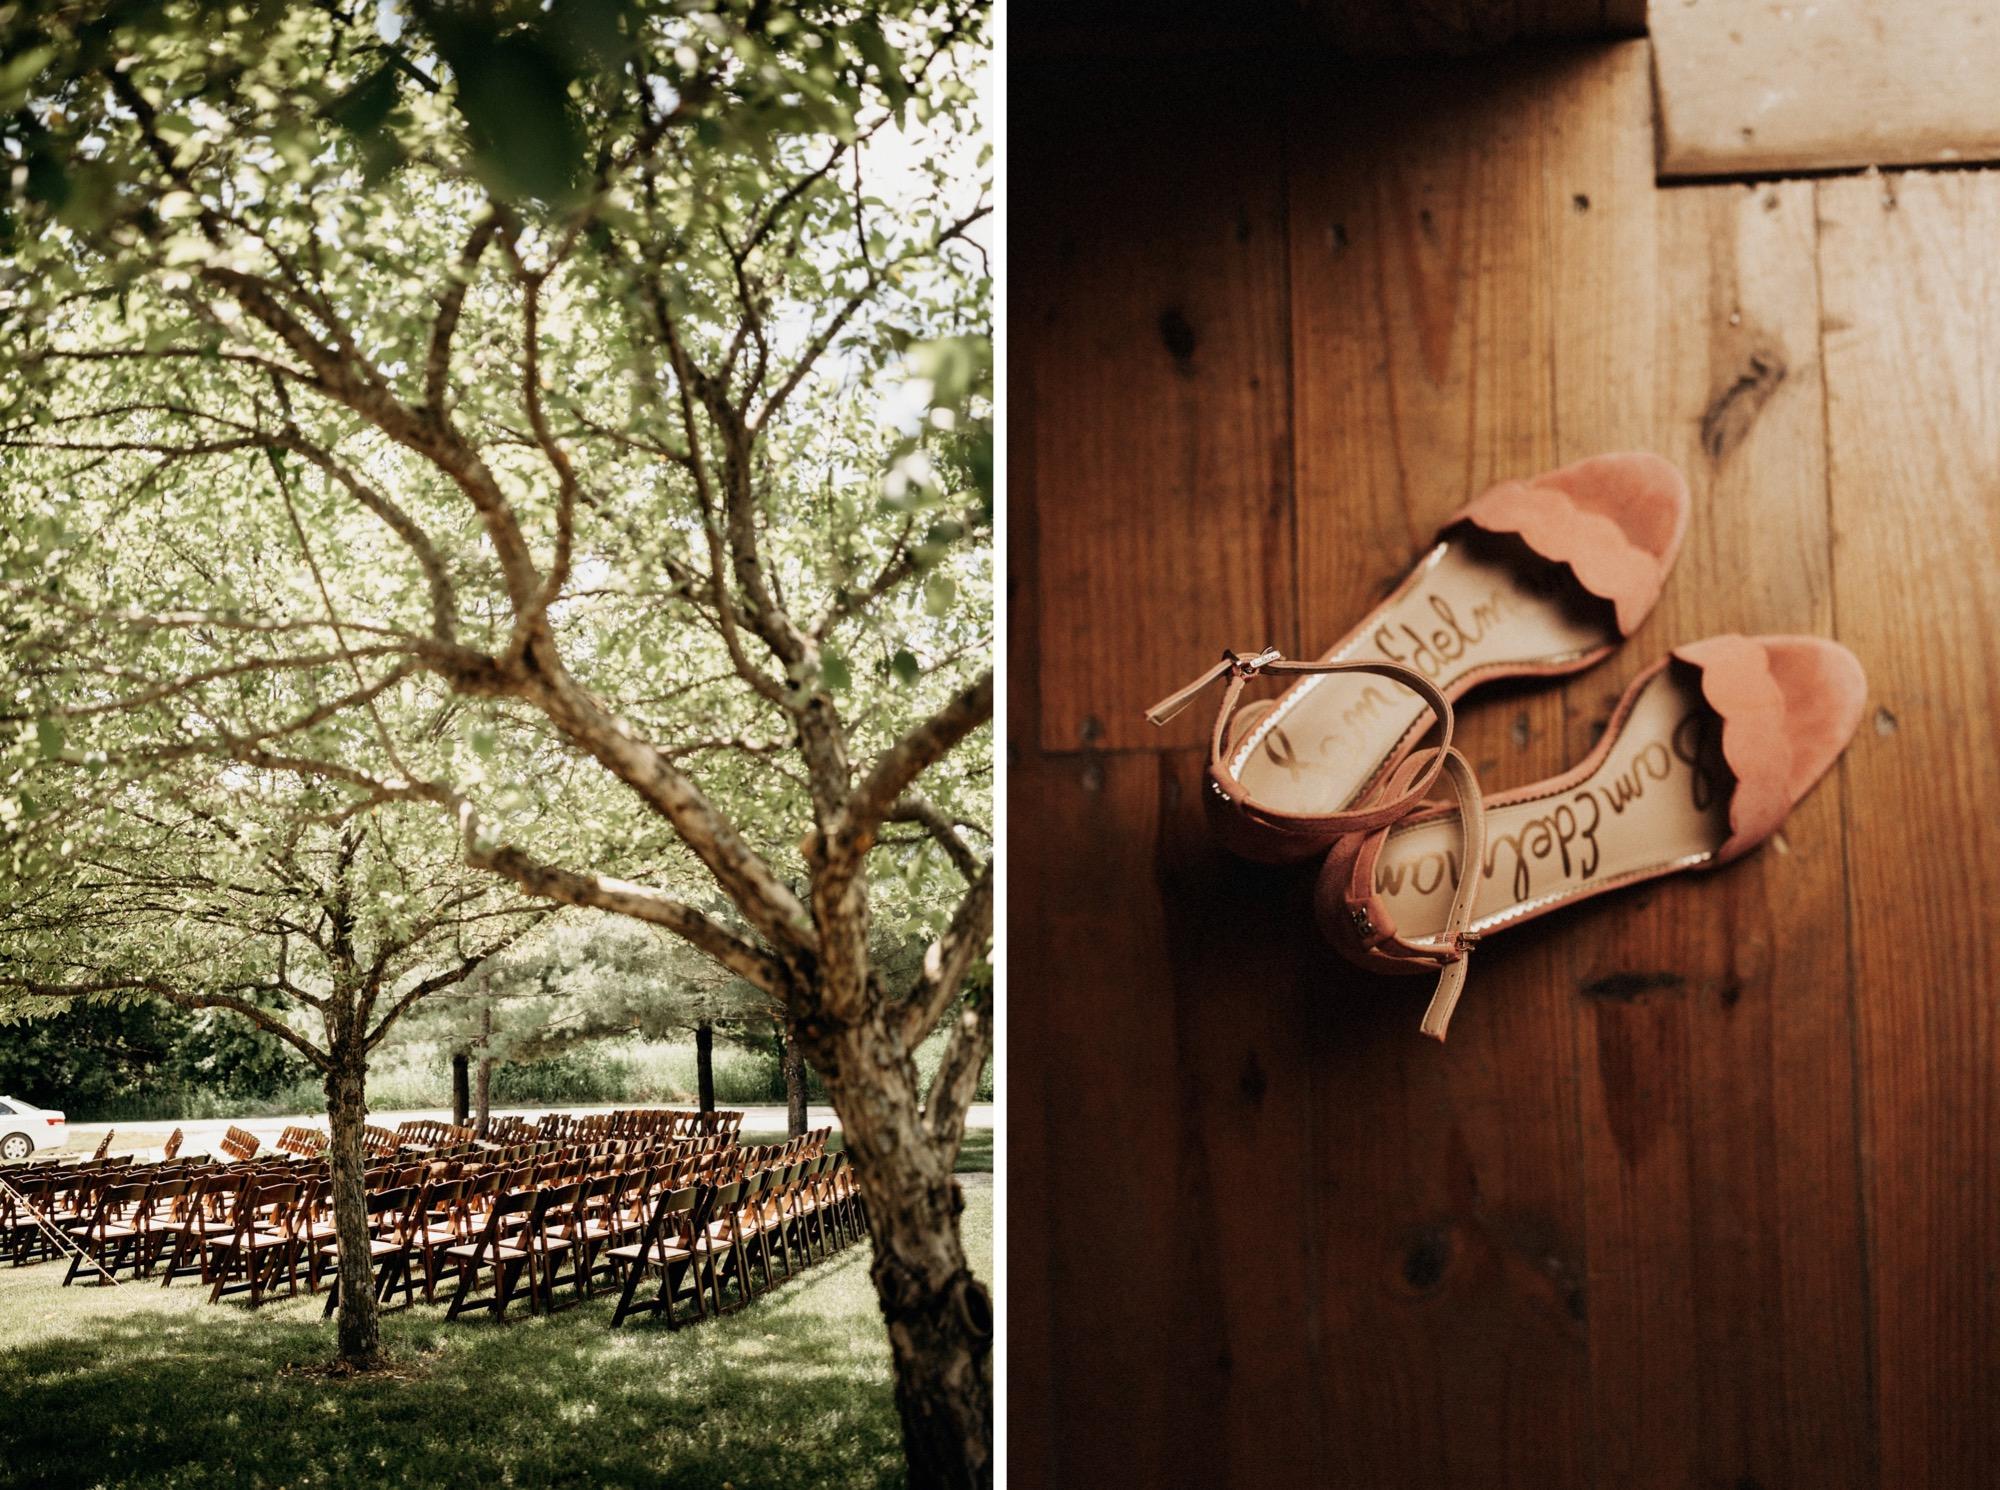 stonehaven_barn_wedding_des_moines_02.jpg